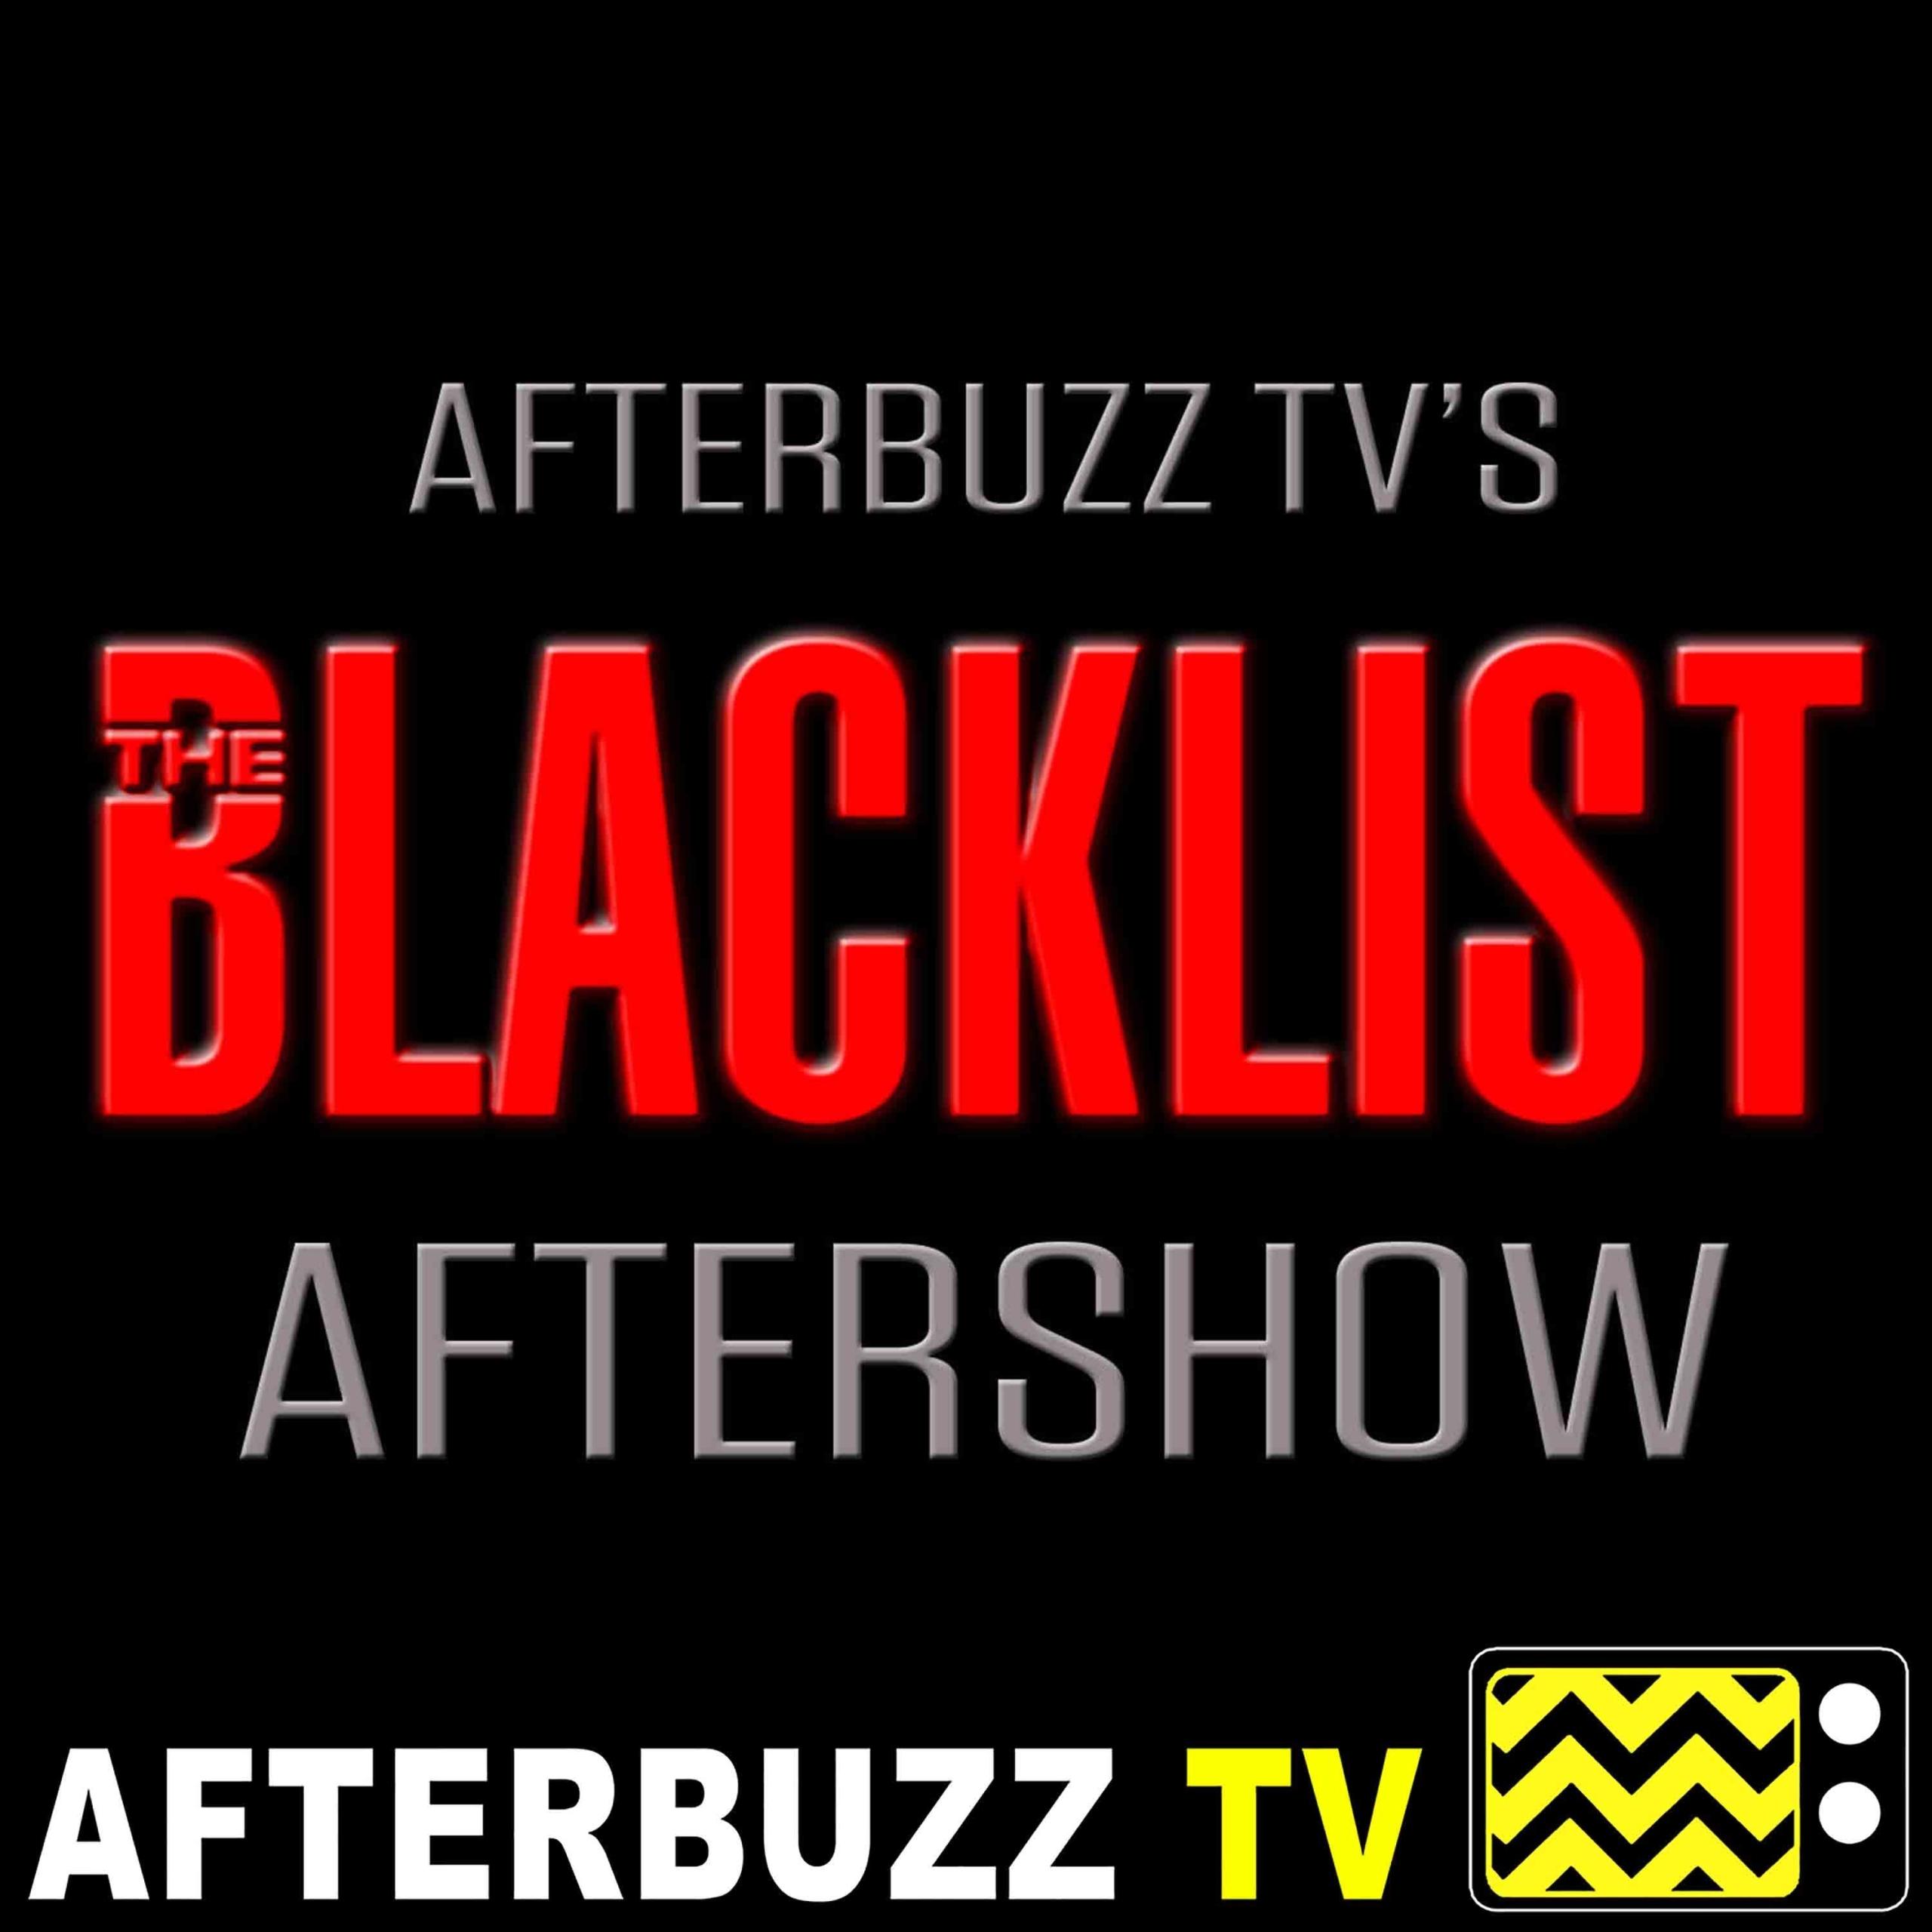 The Blacklist S:4 | Mr. Kaplan E:21 & E:22 | AfterBuzz TV AfterShow